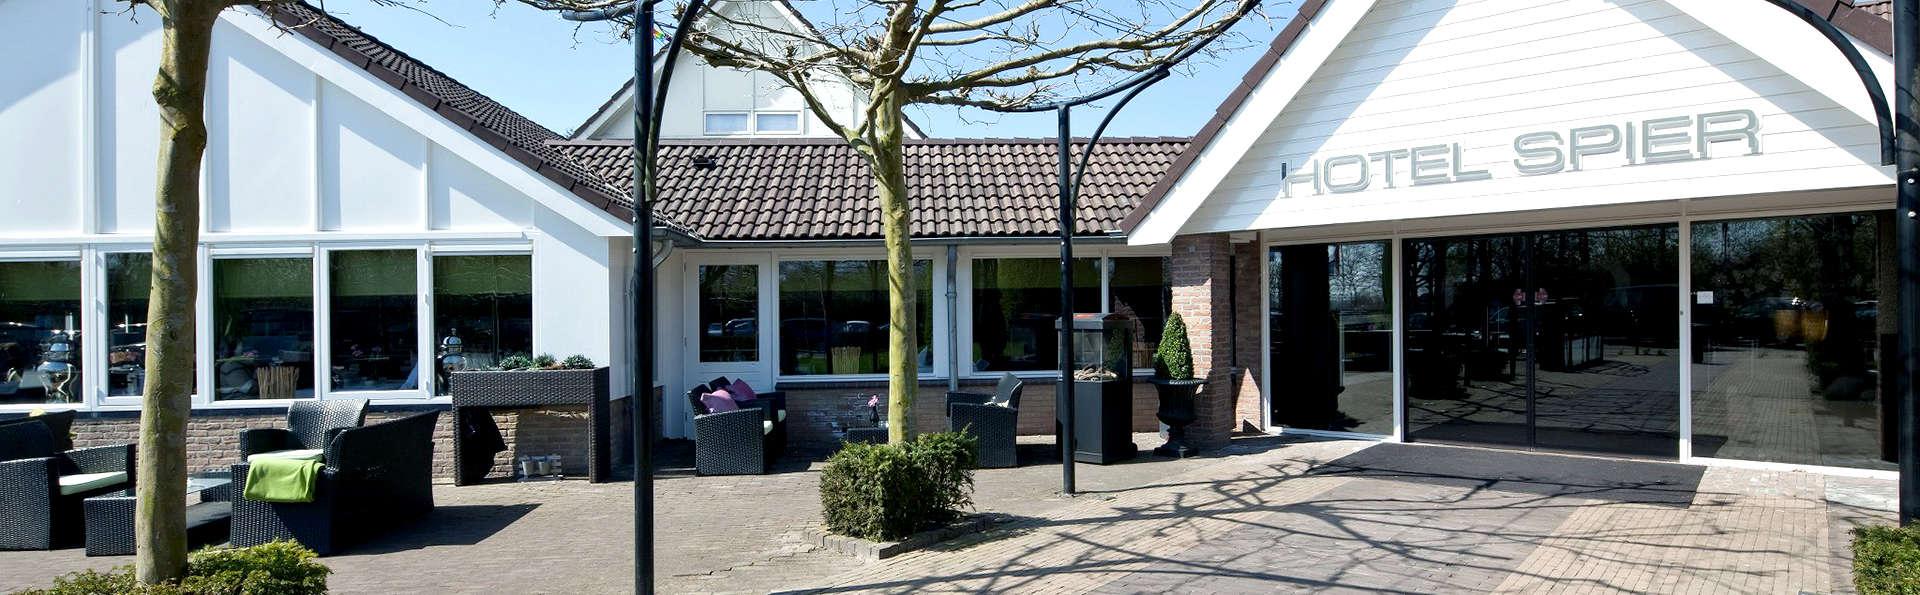 Van der Valk Hotel Spier - Dwingeloo - Edit_Front2.jpg